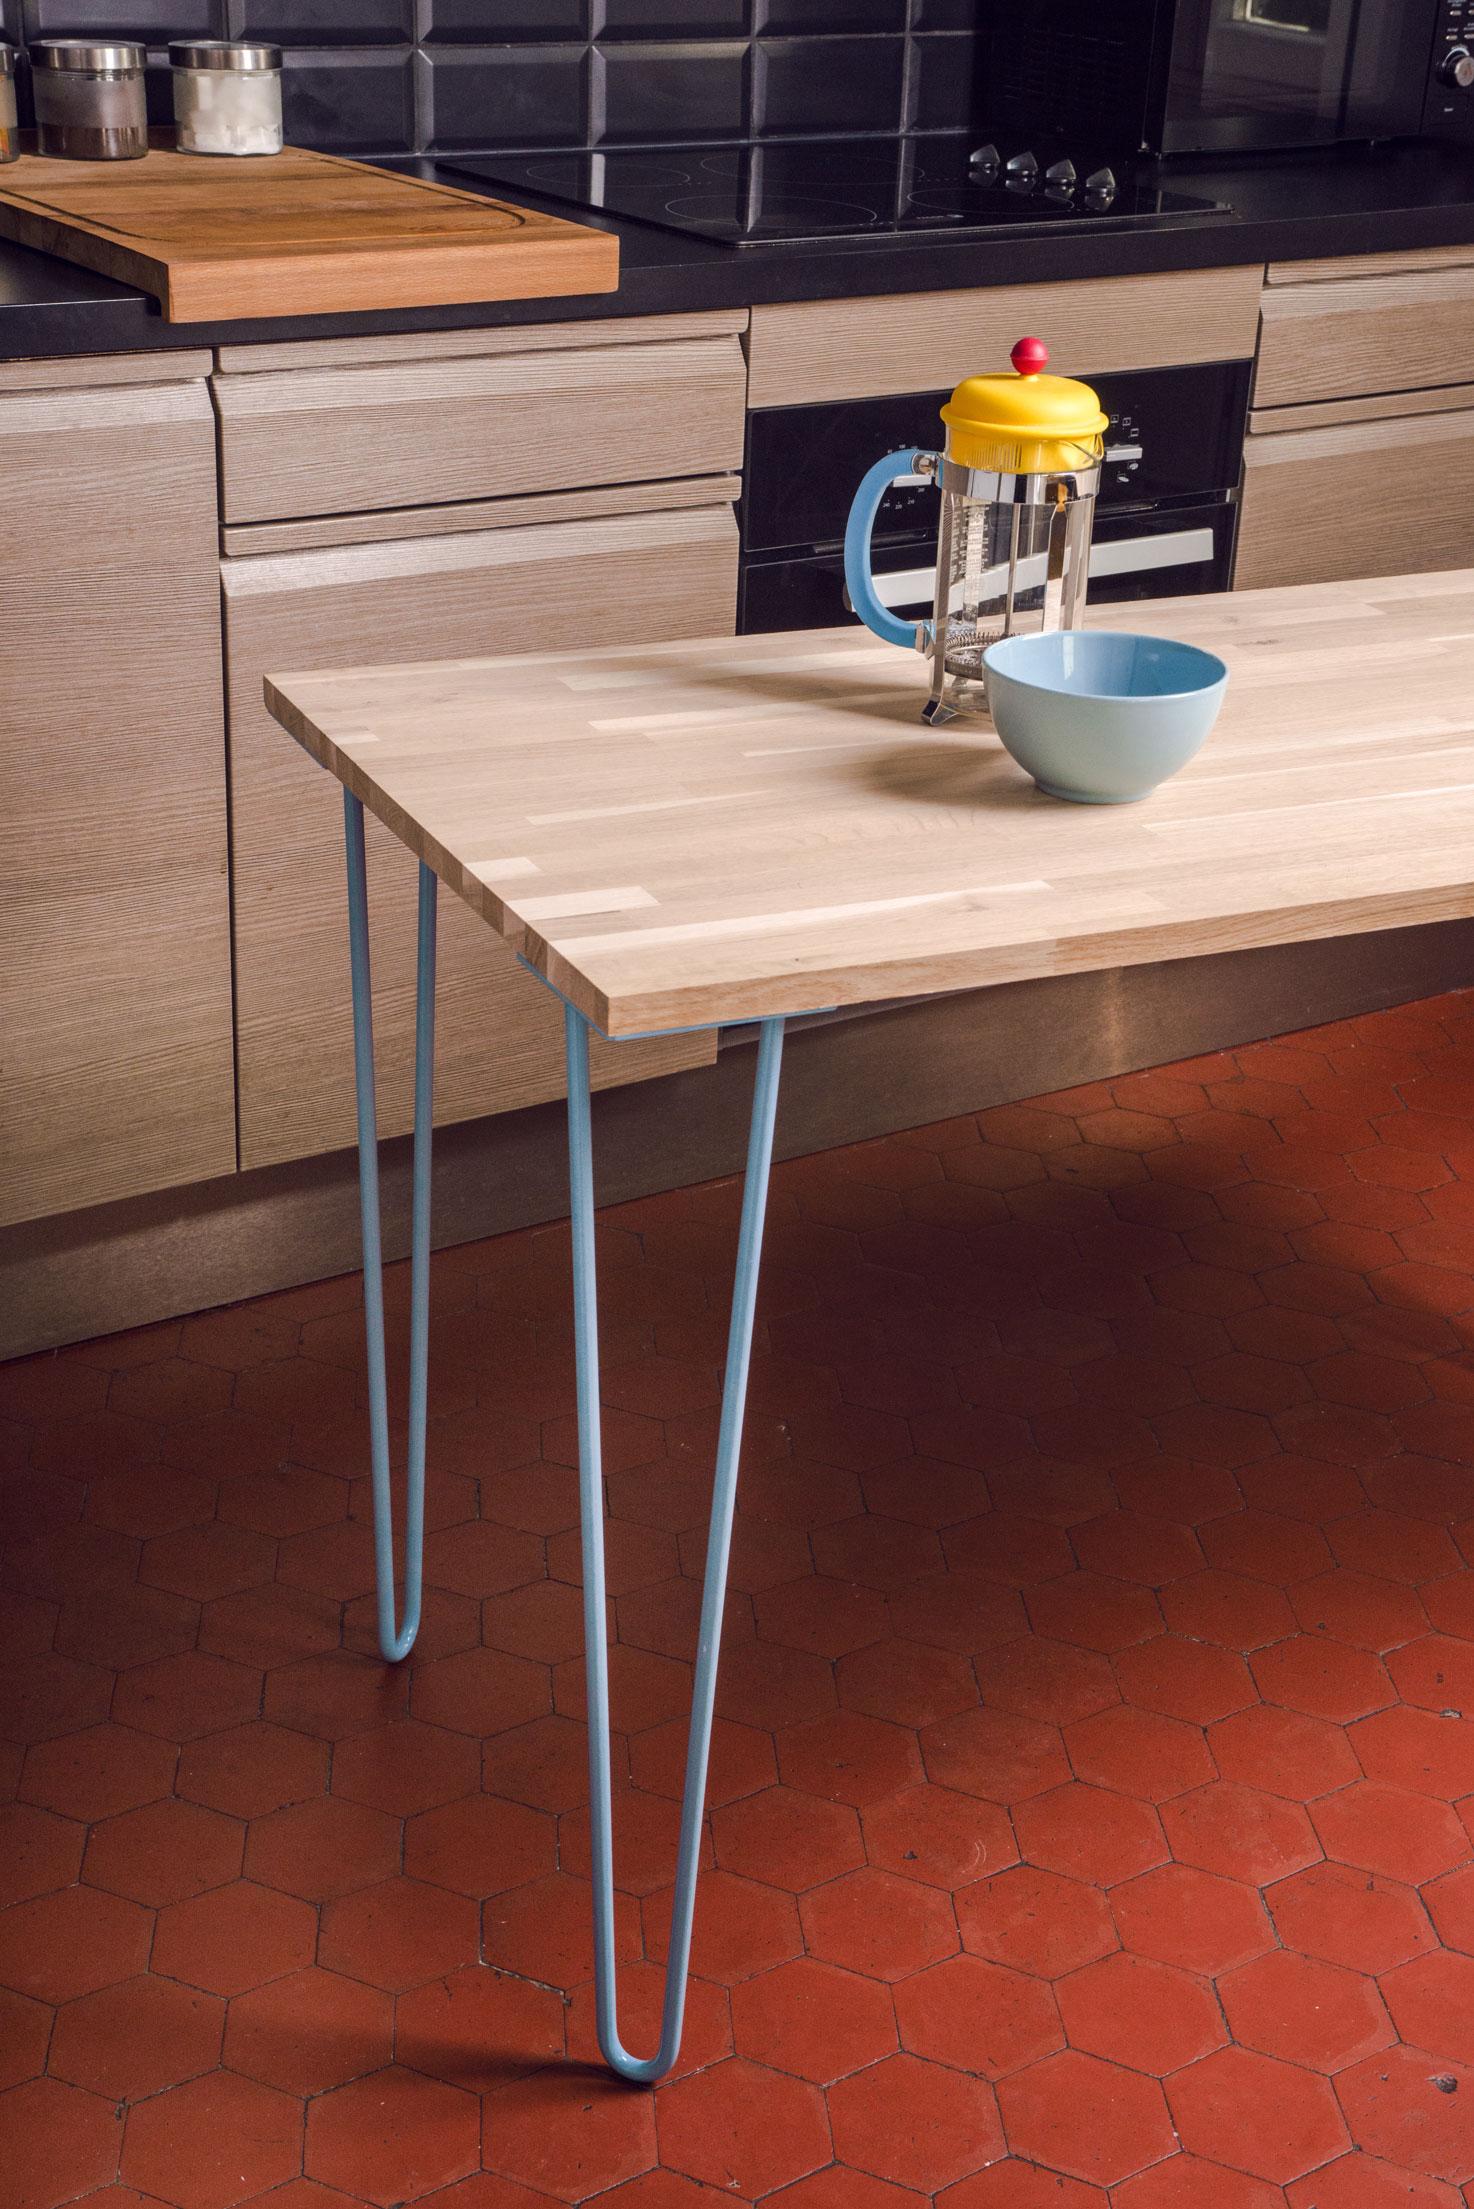 Ripaton Pieds De Table atelier ripaton : le pied de table en acier made in france